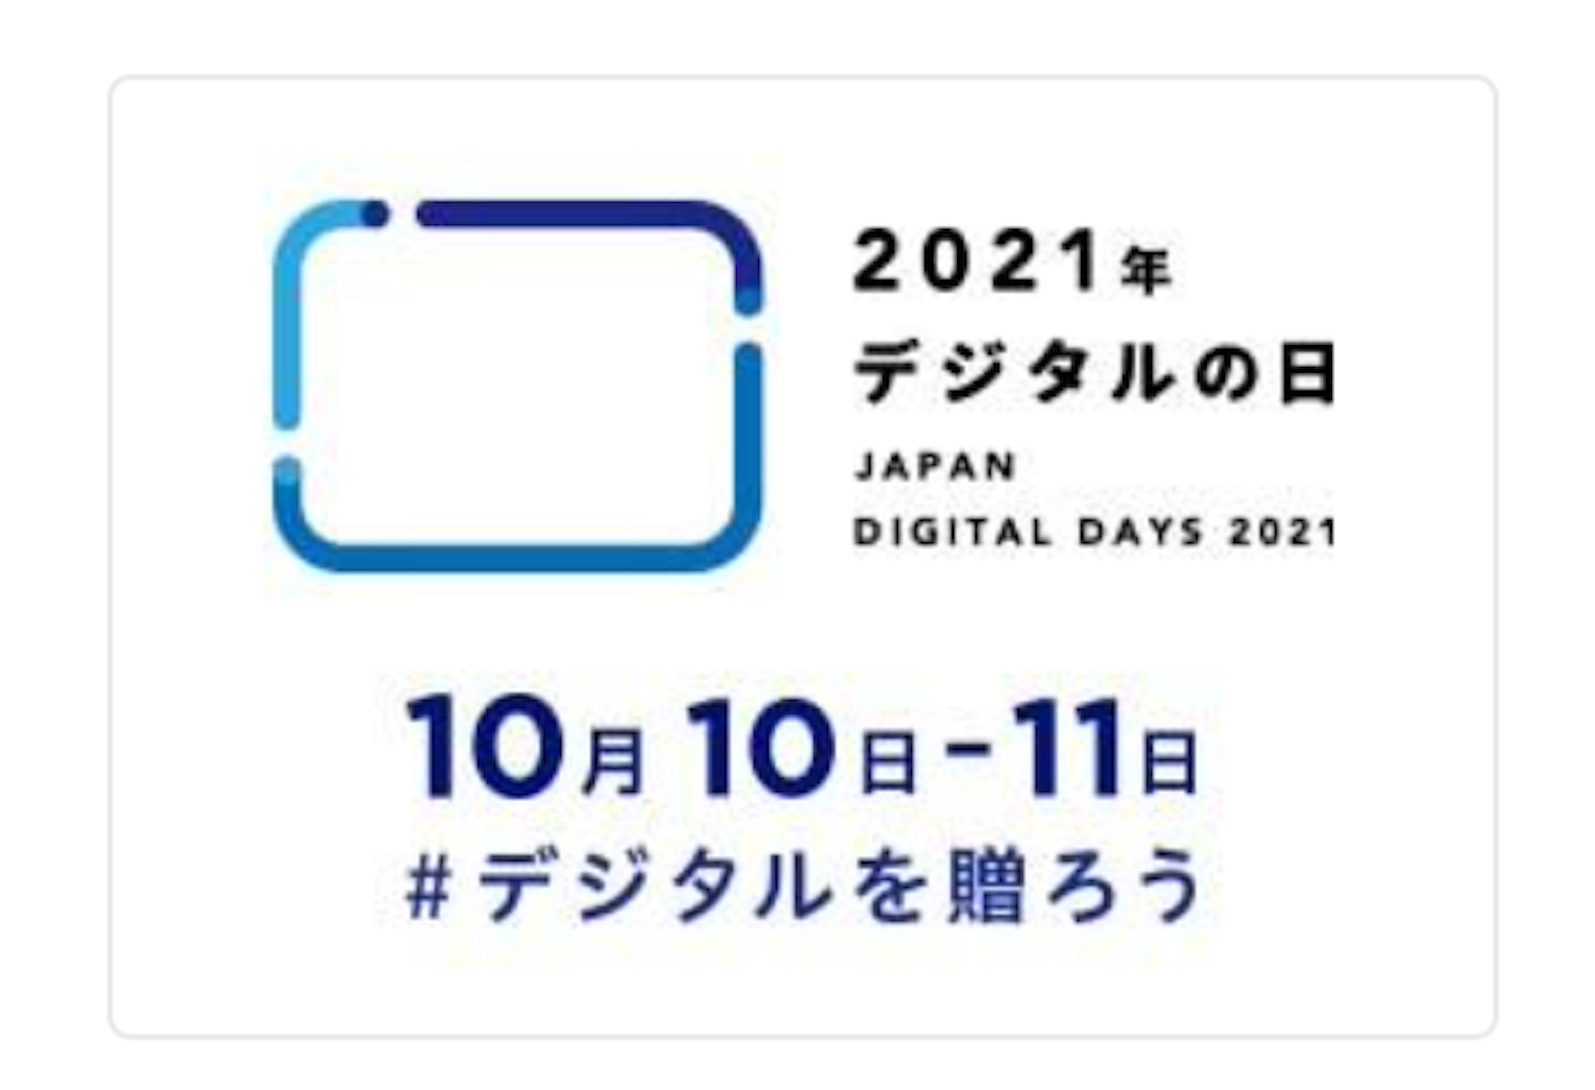 day of digital